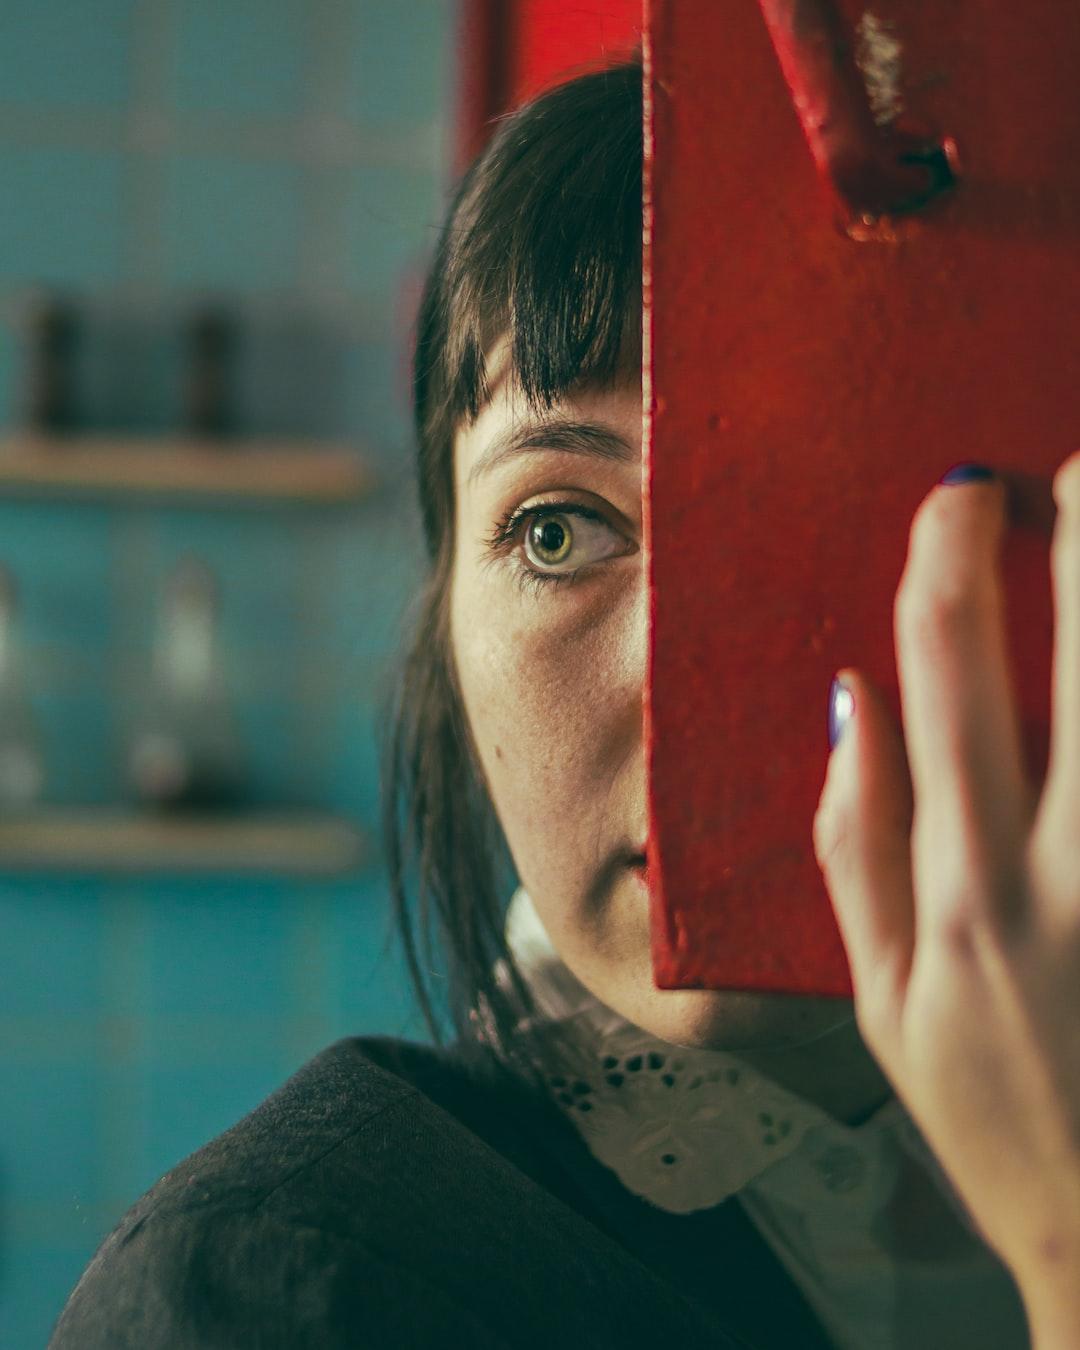 A woman hiding behind a shelf.